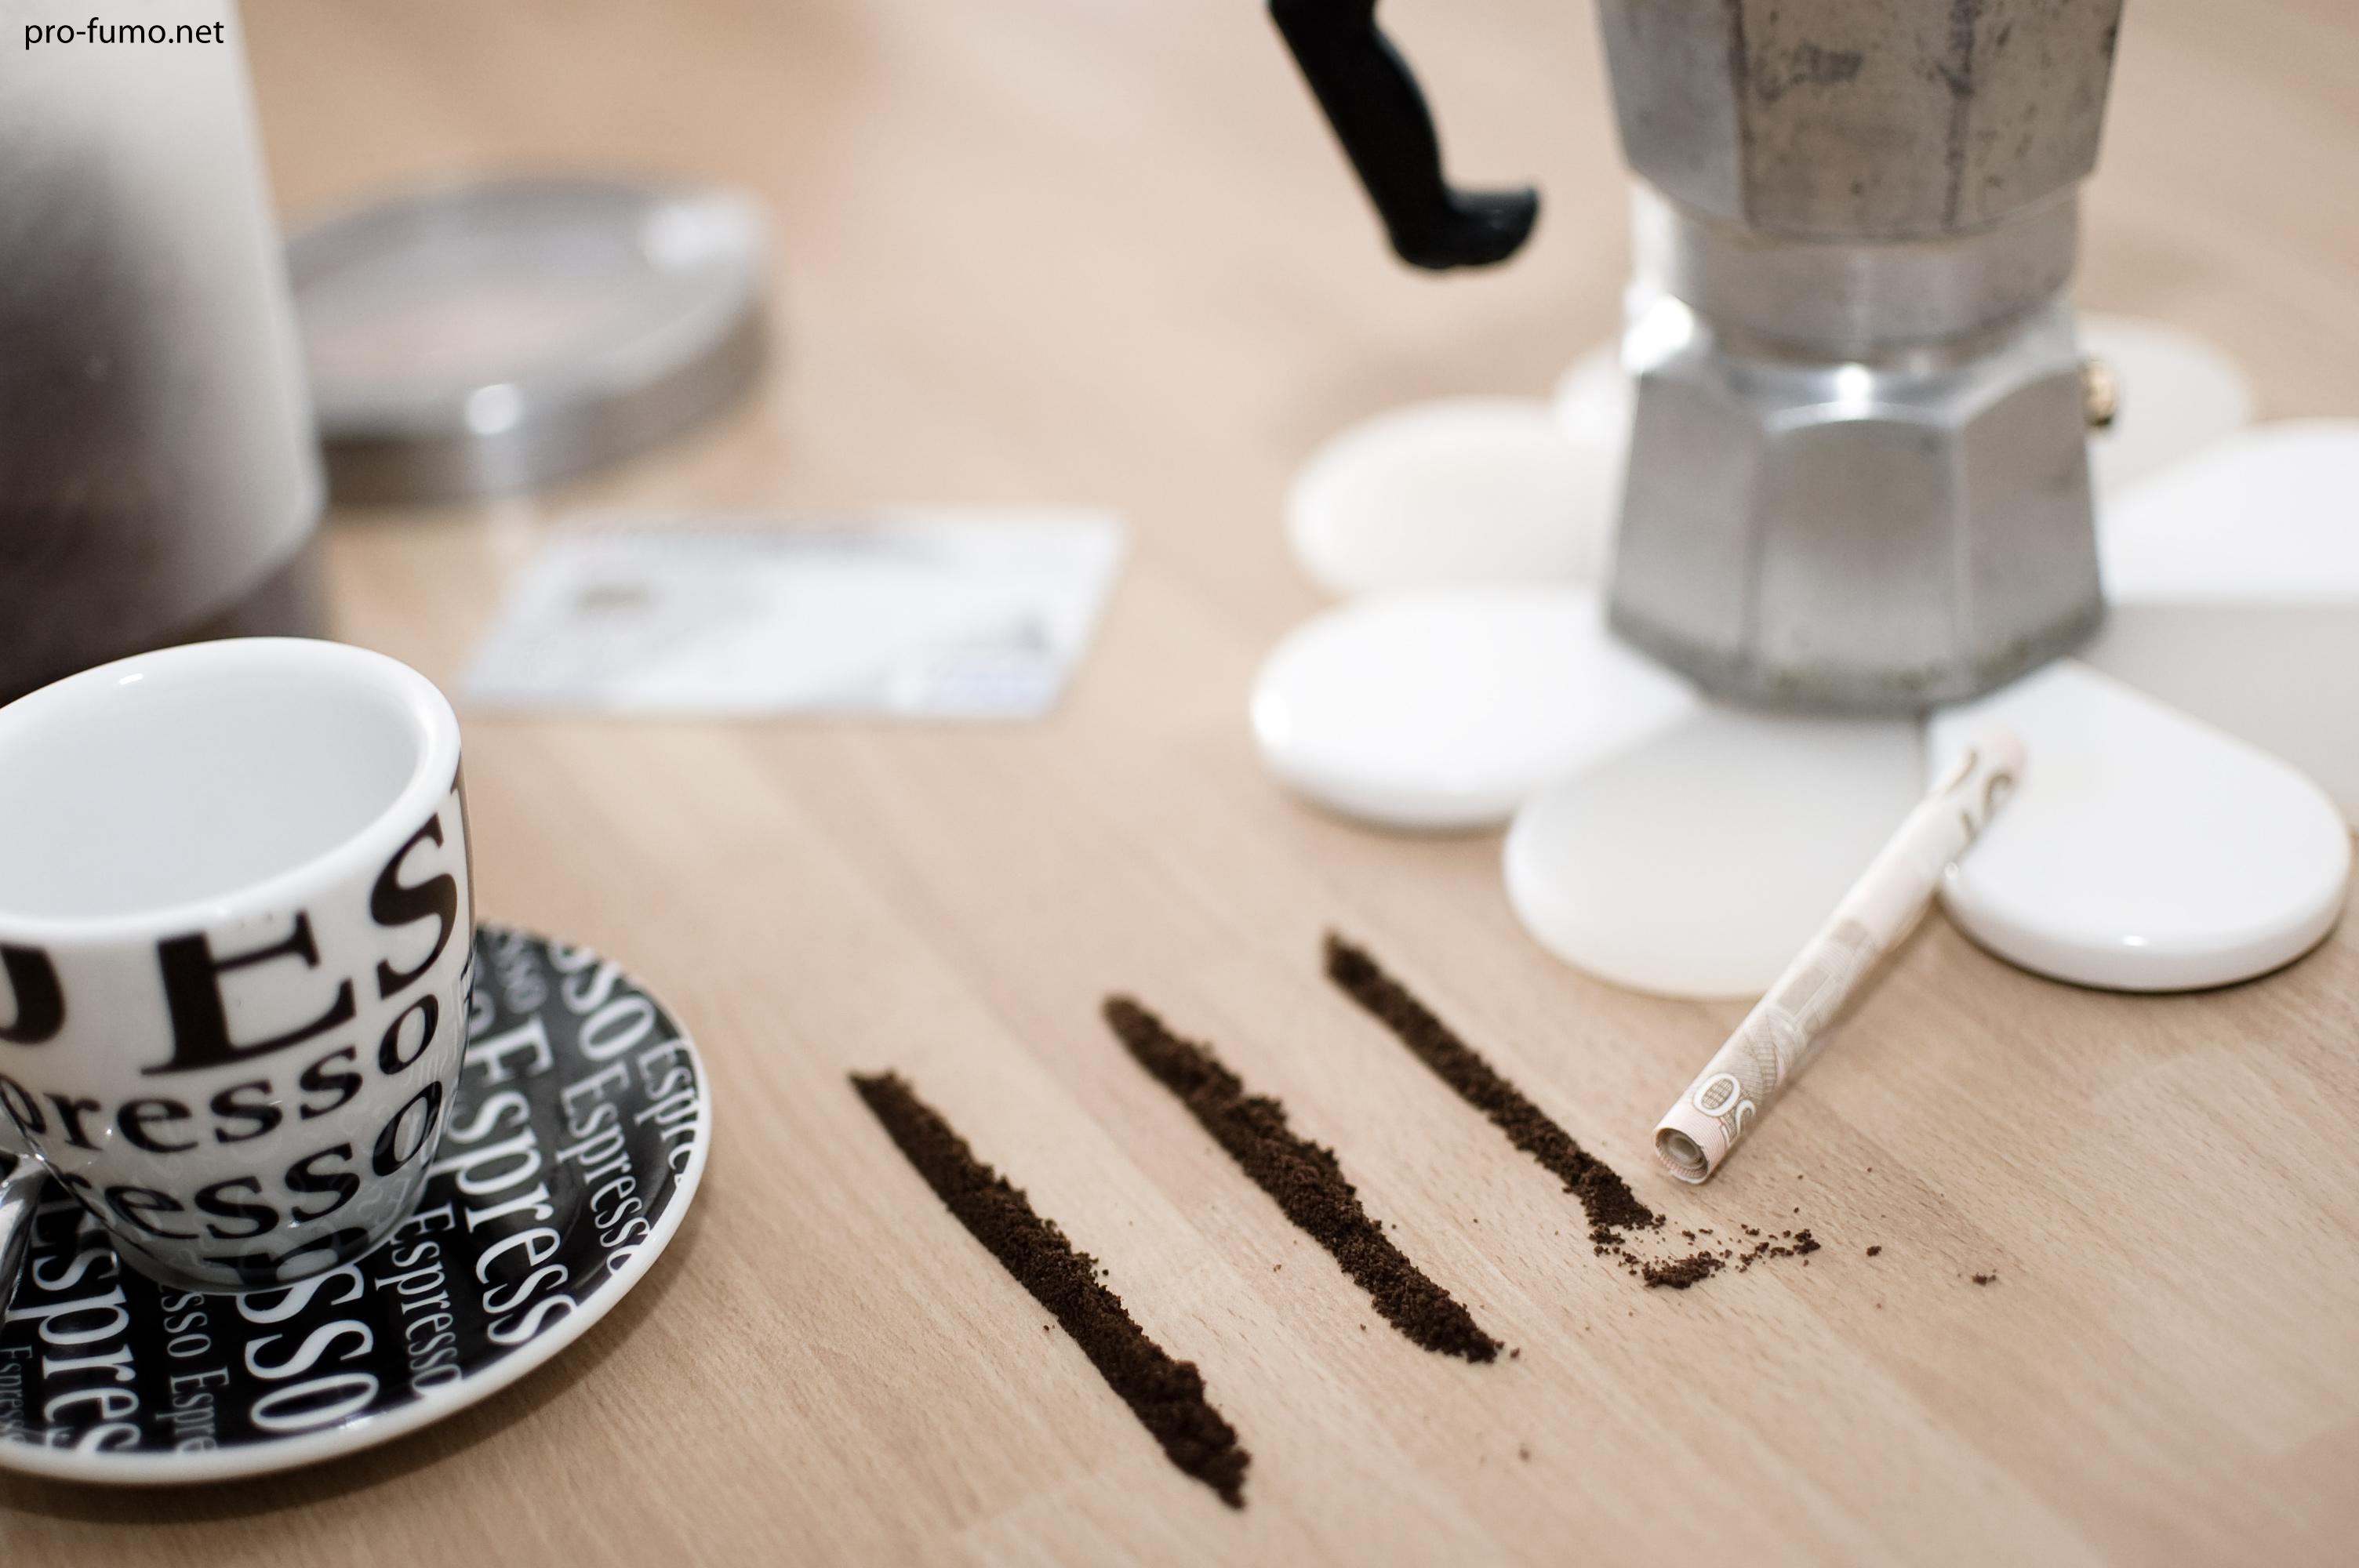 imagen graciosa cafe lunes